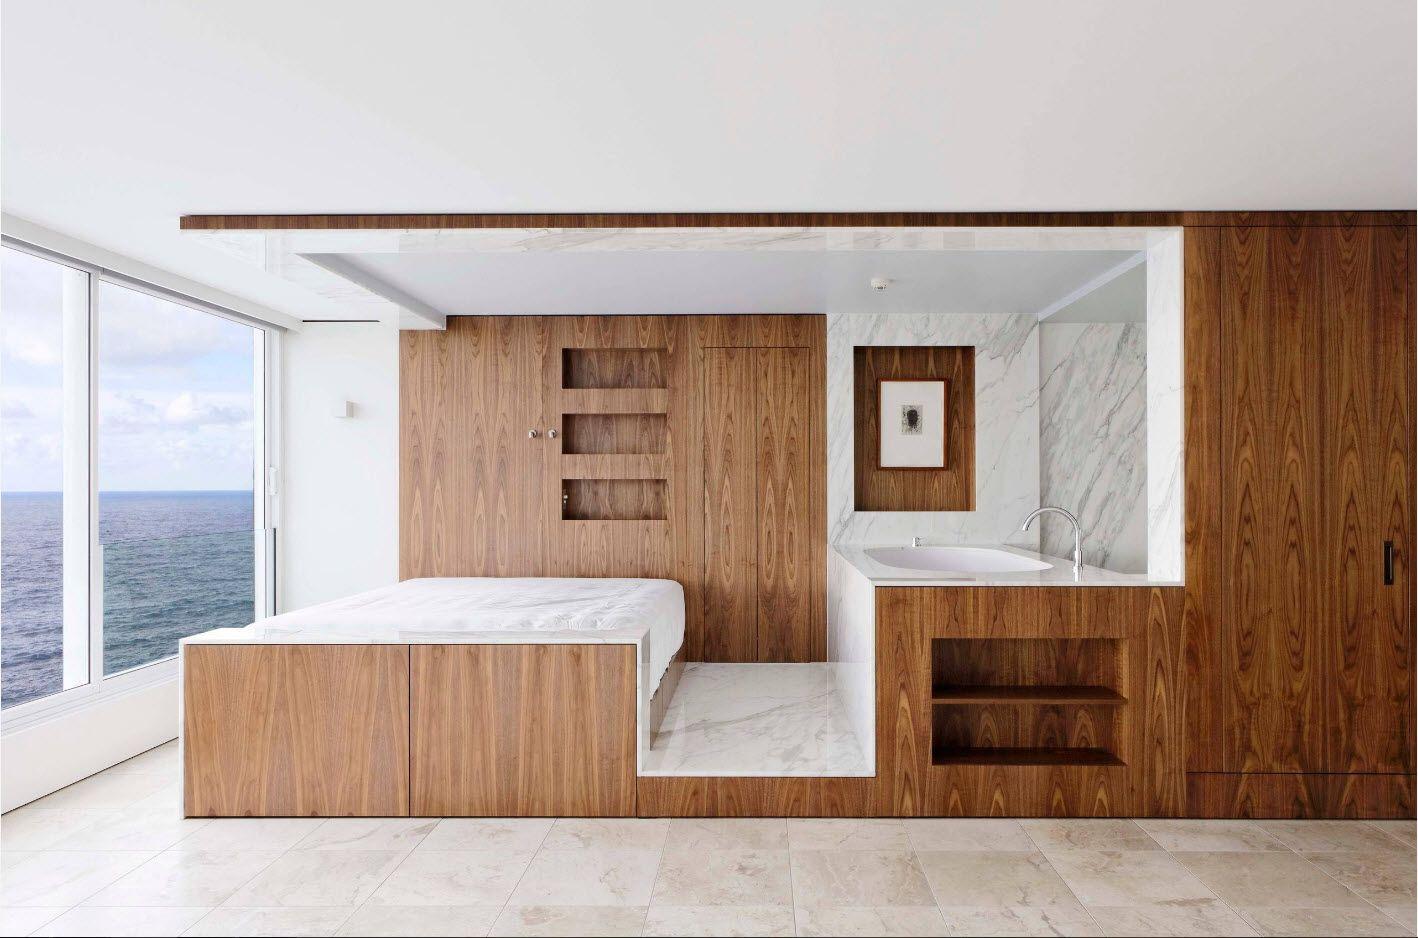 apartment interior design inspiration ideas & trends 2017 - small